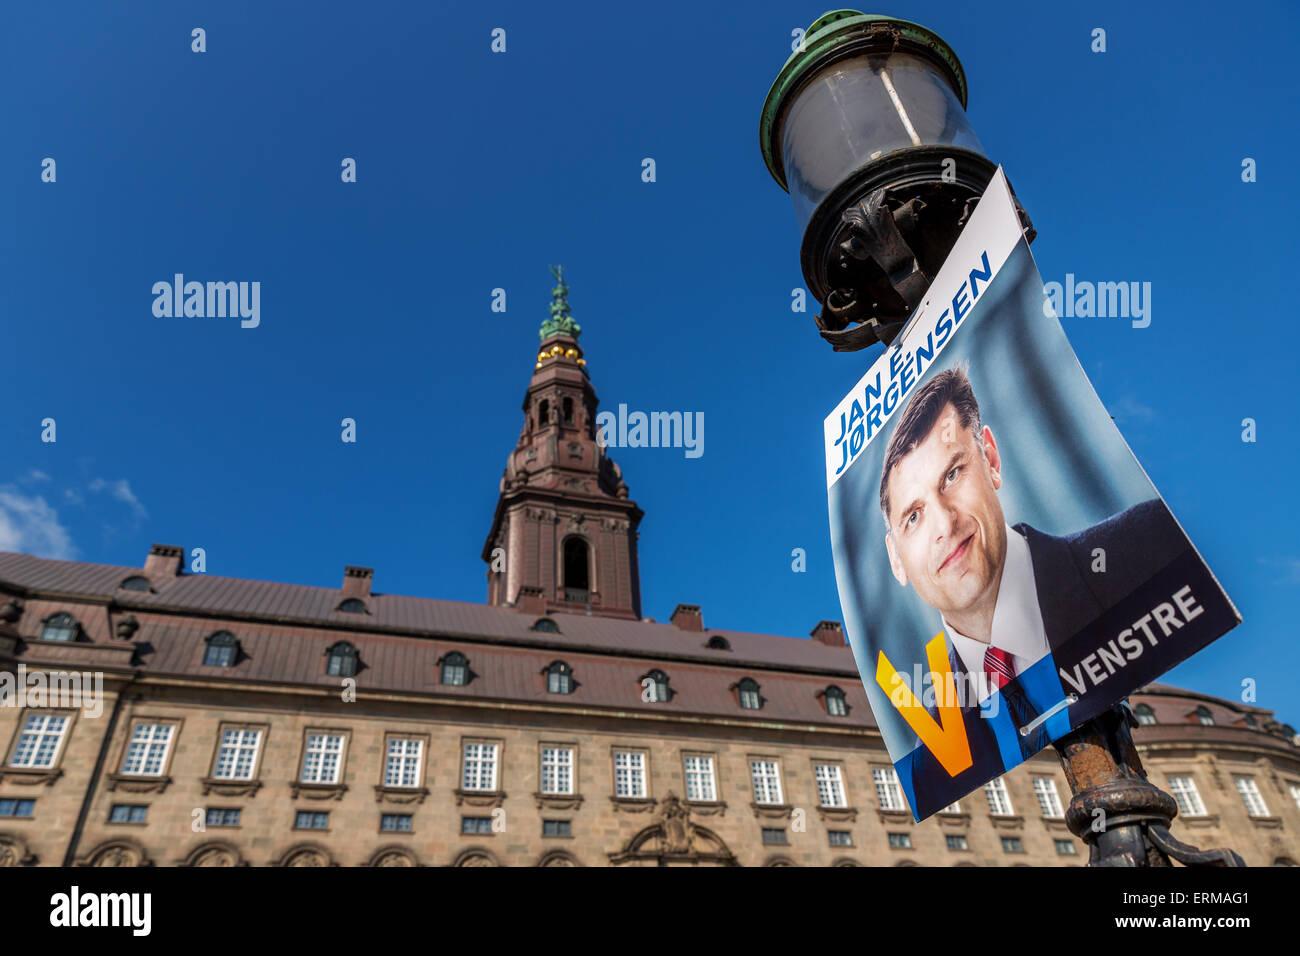 Election poster promoting Jan E. Jørgensen in front of the Danish Parliament, Copenhagen, Denmark - Stock Image